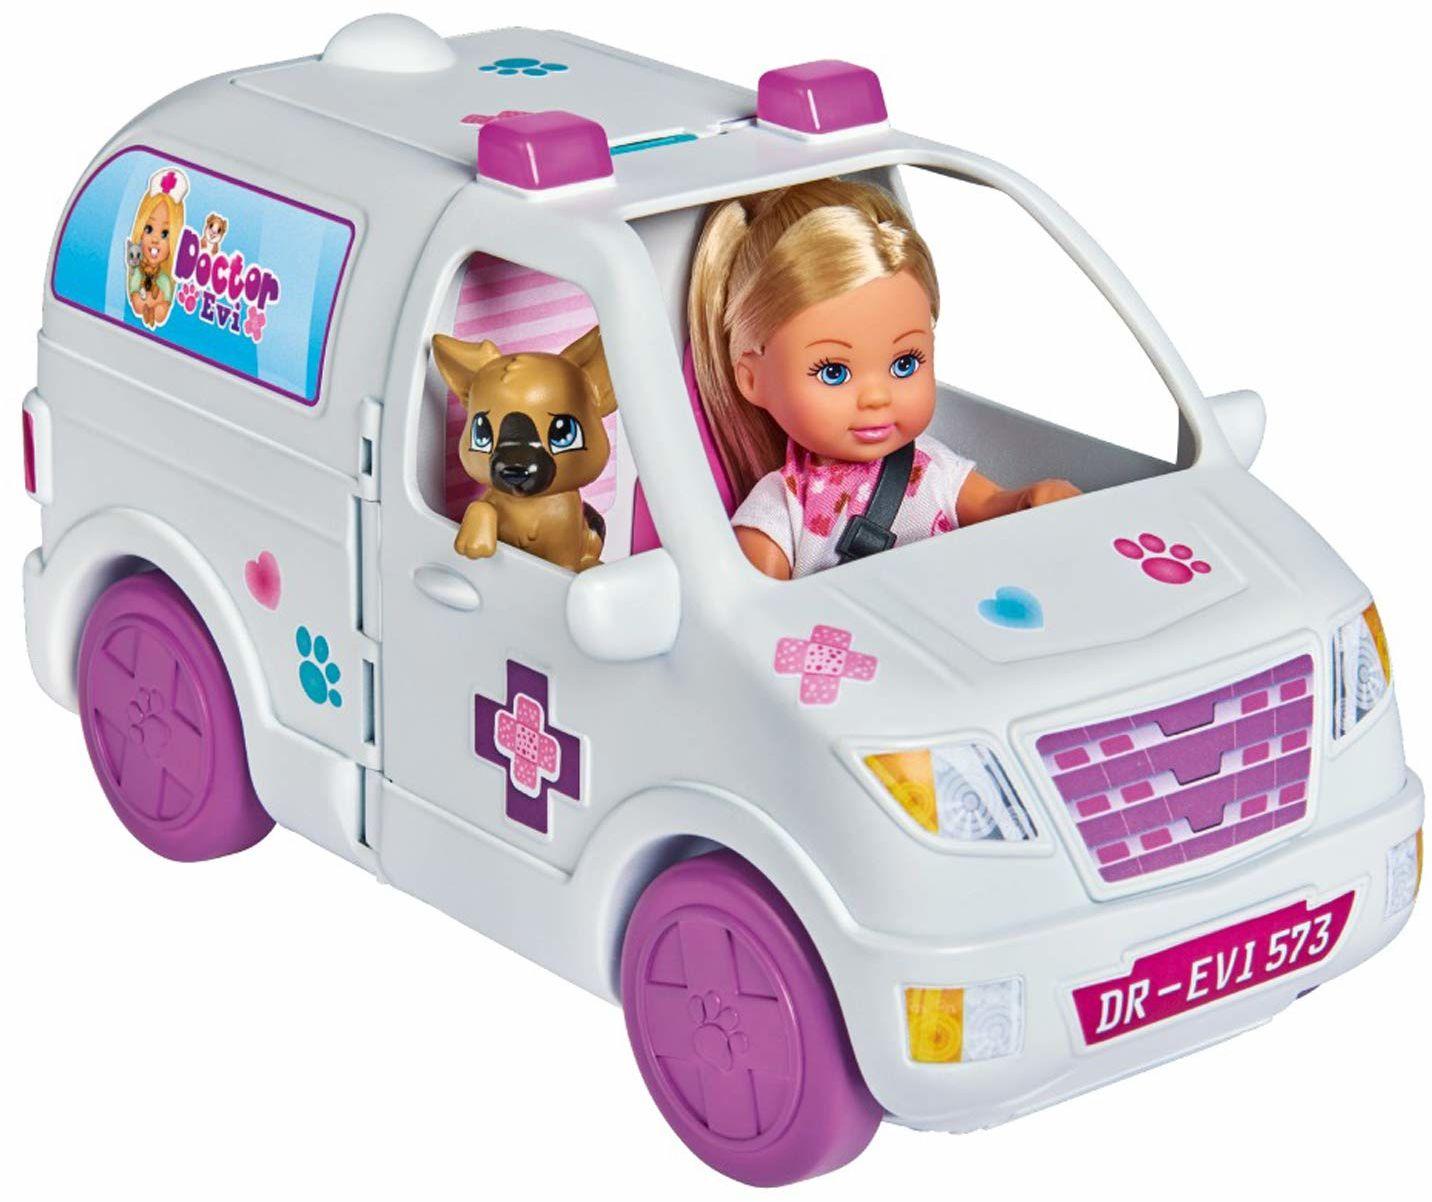 Simba EL Doktor Evi Ambulans 2 W 1 105733488038